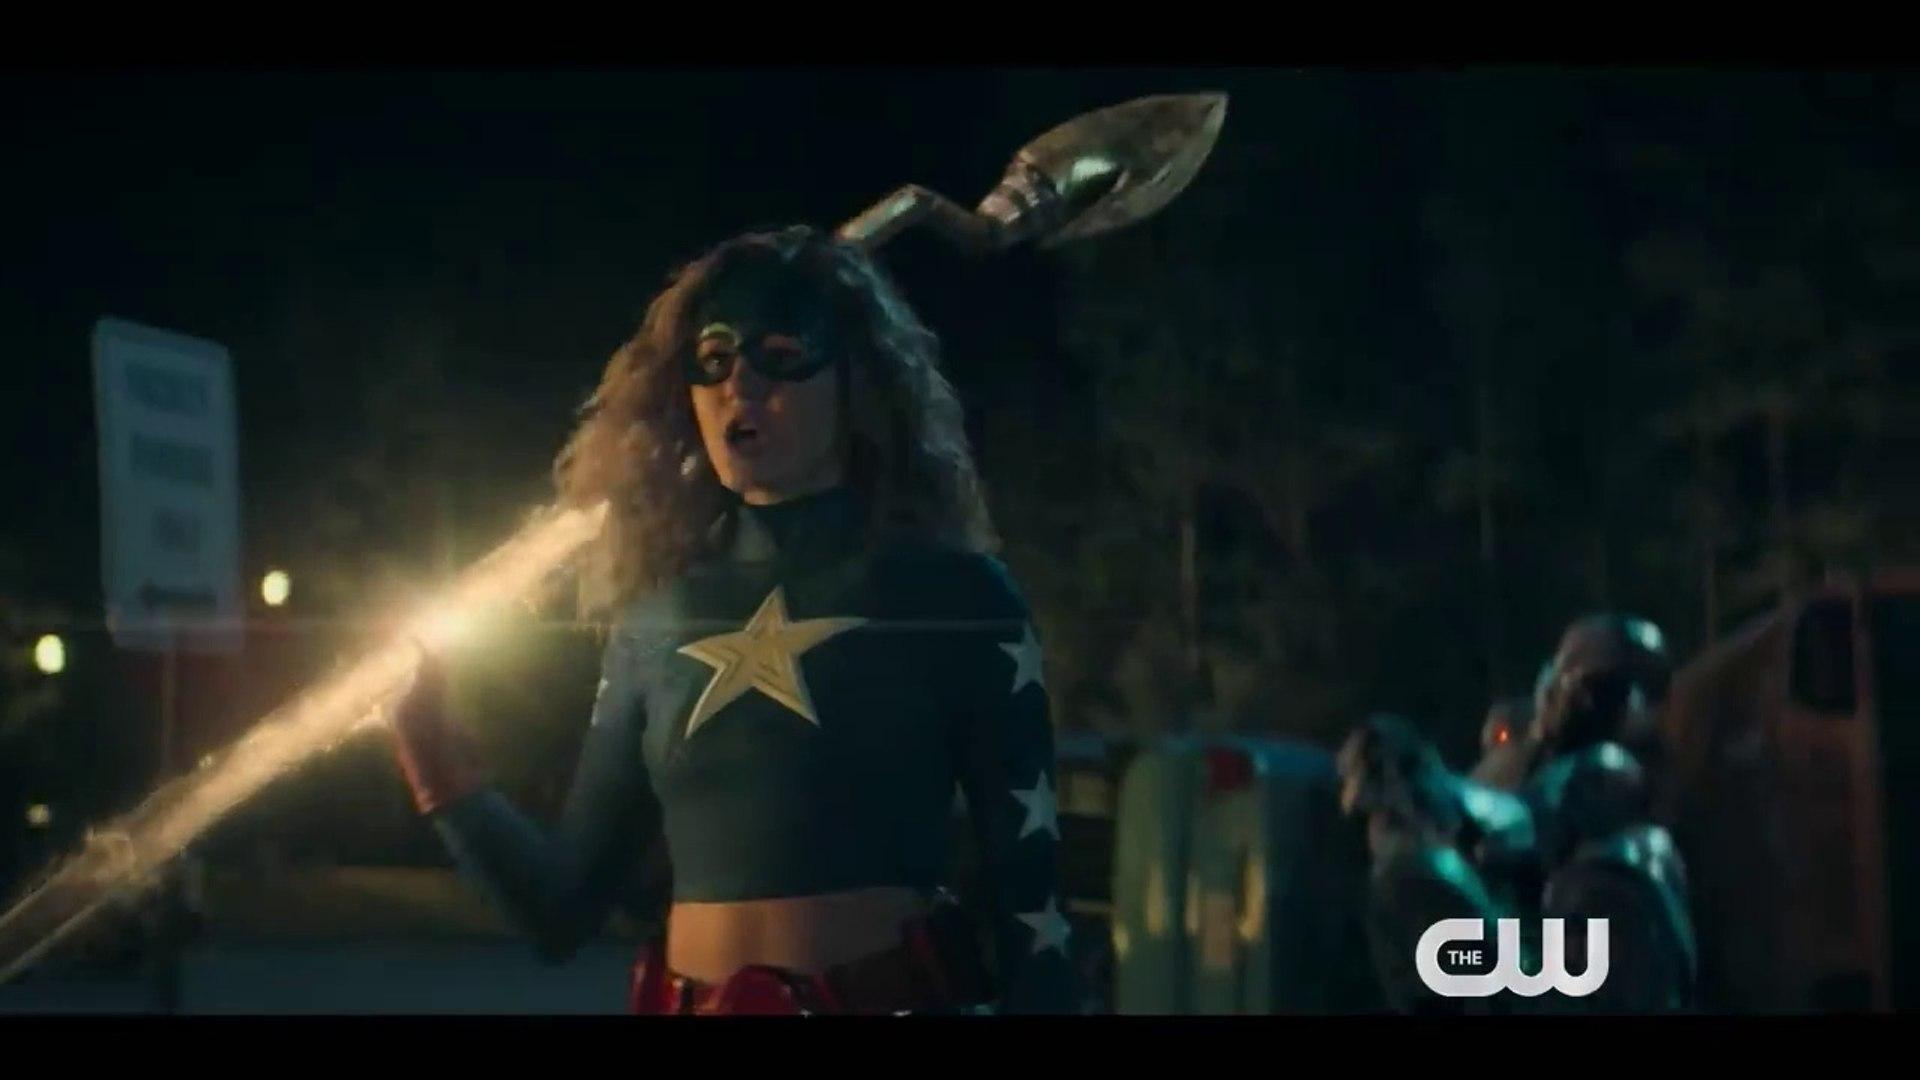 Stargirl (The CW) 'Destiny' Trailer HD - Superhero series